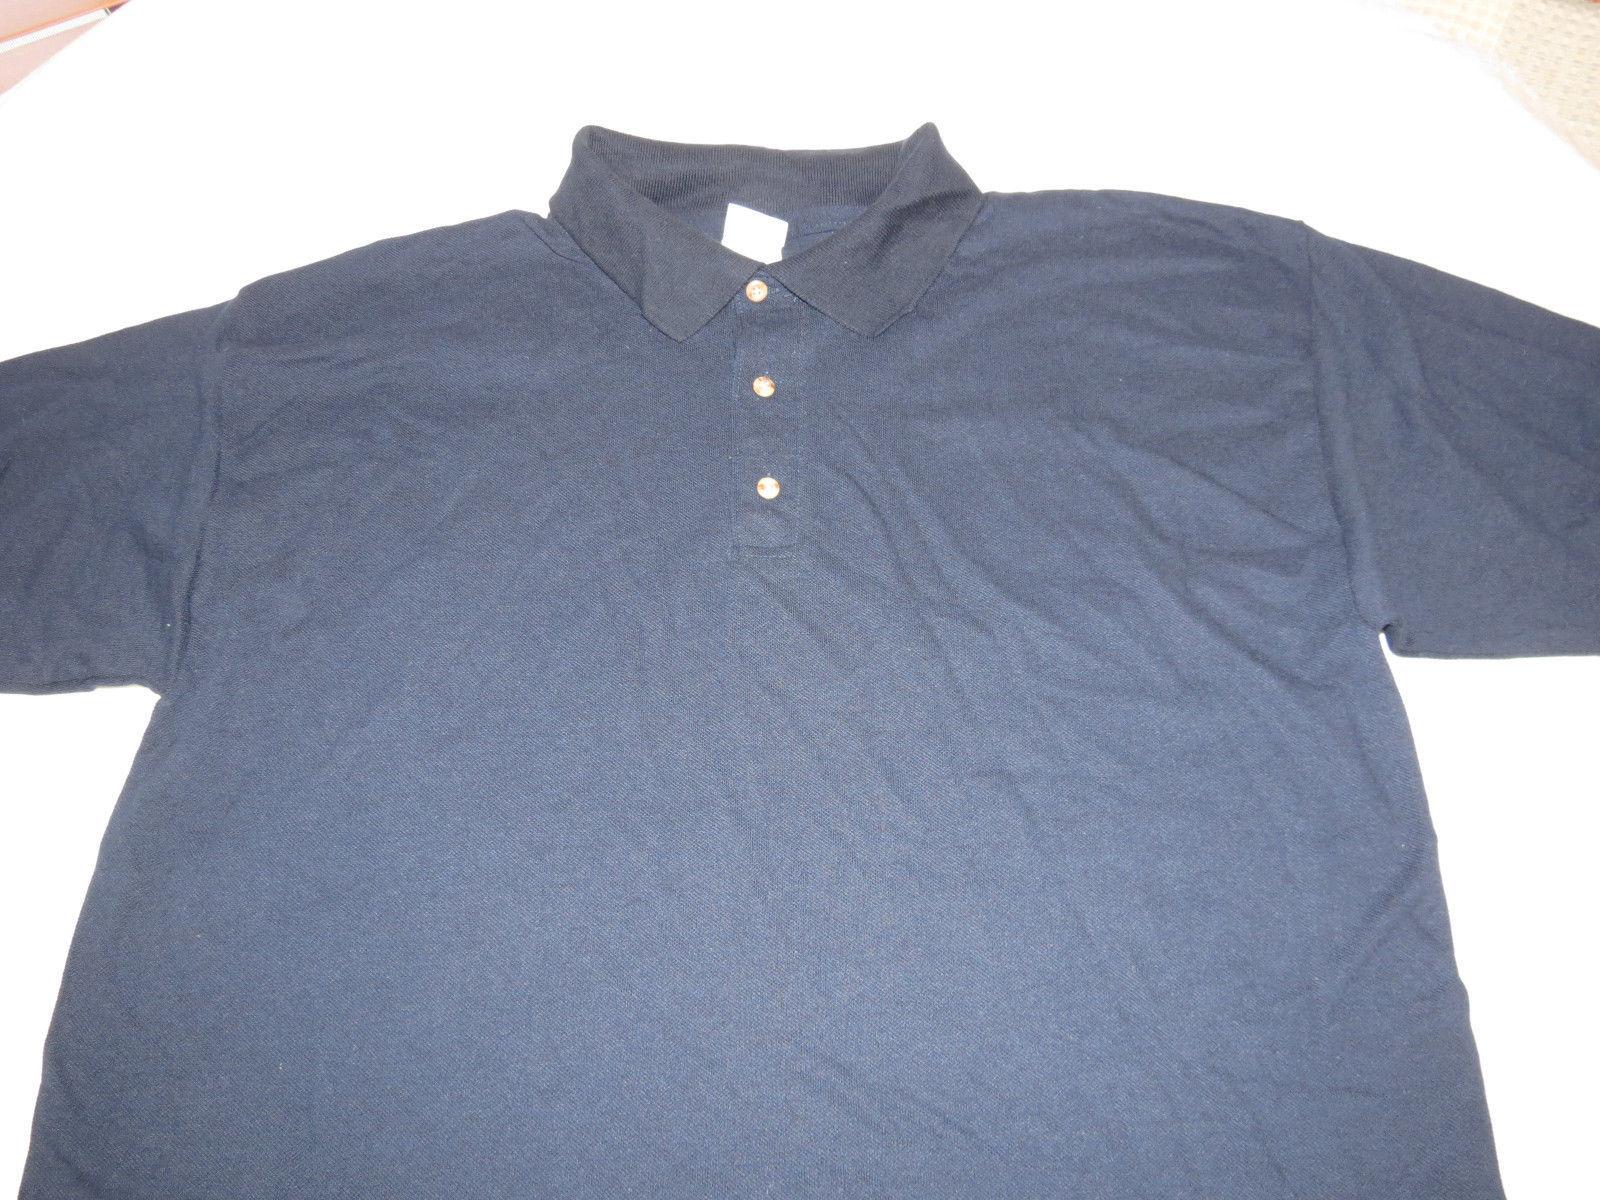 Gildan Activewear Ultrablend Heavyweight adult S small mens Navy polo shirt NOS